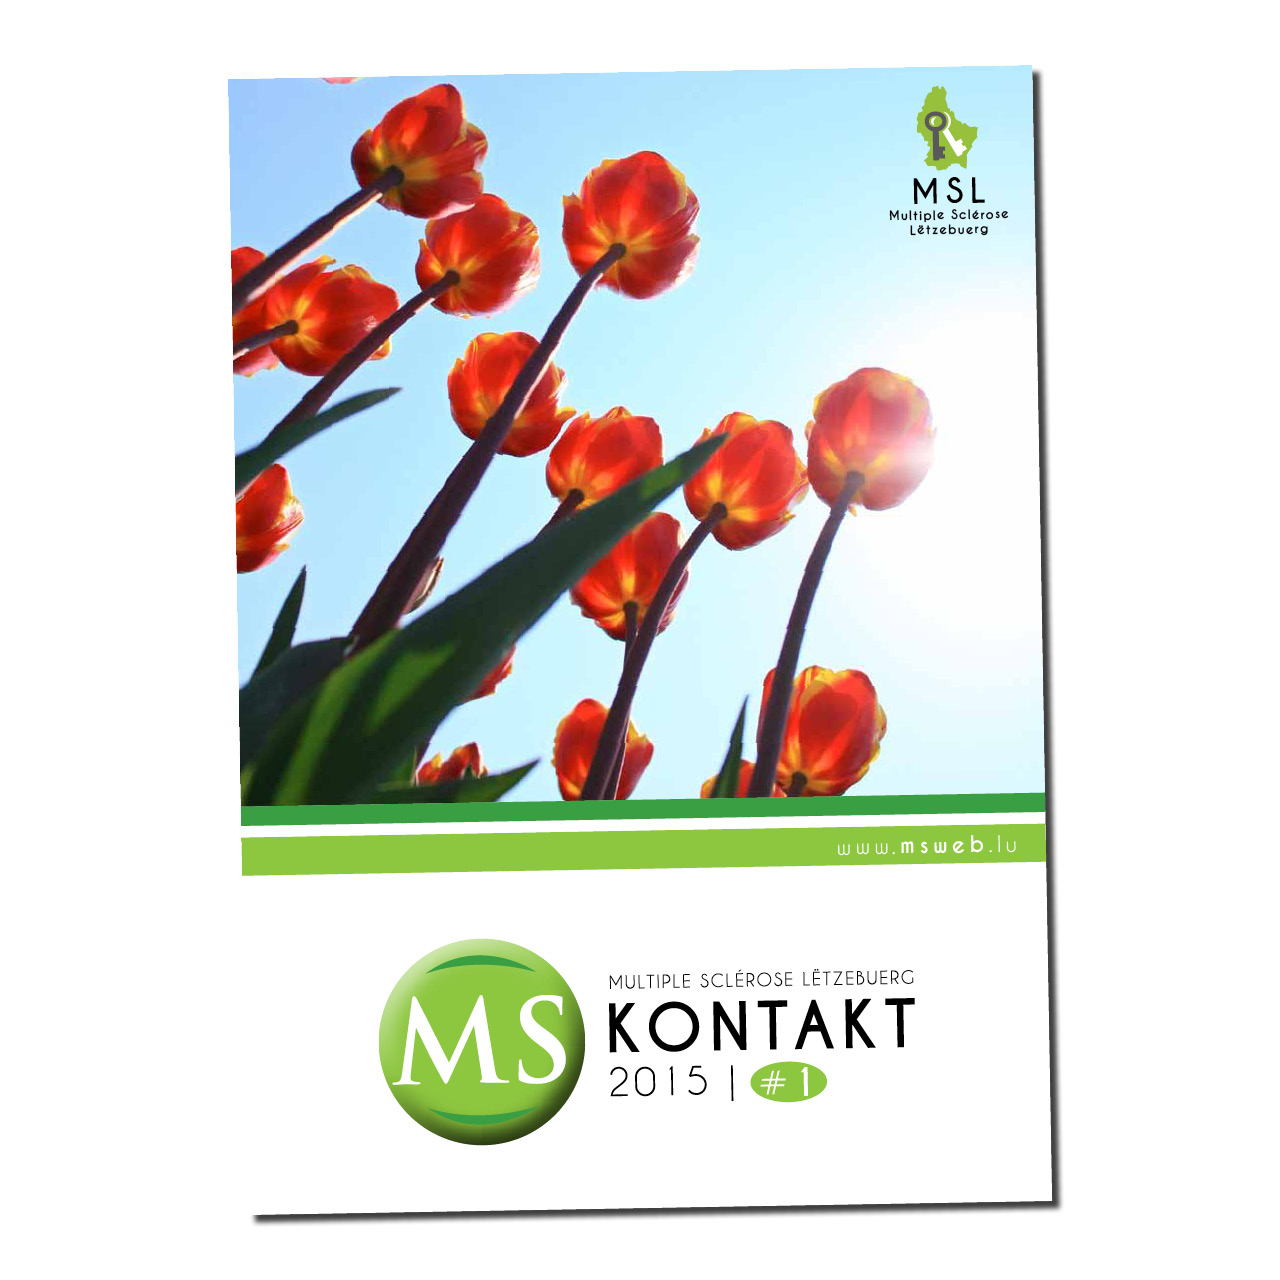 MS Kontakt